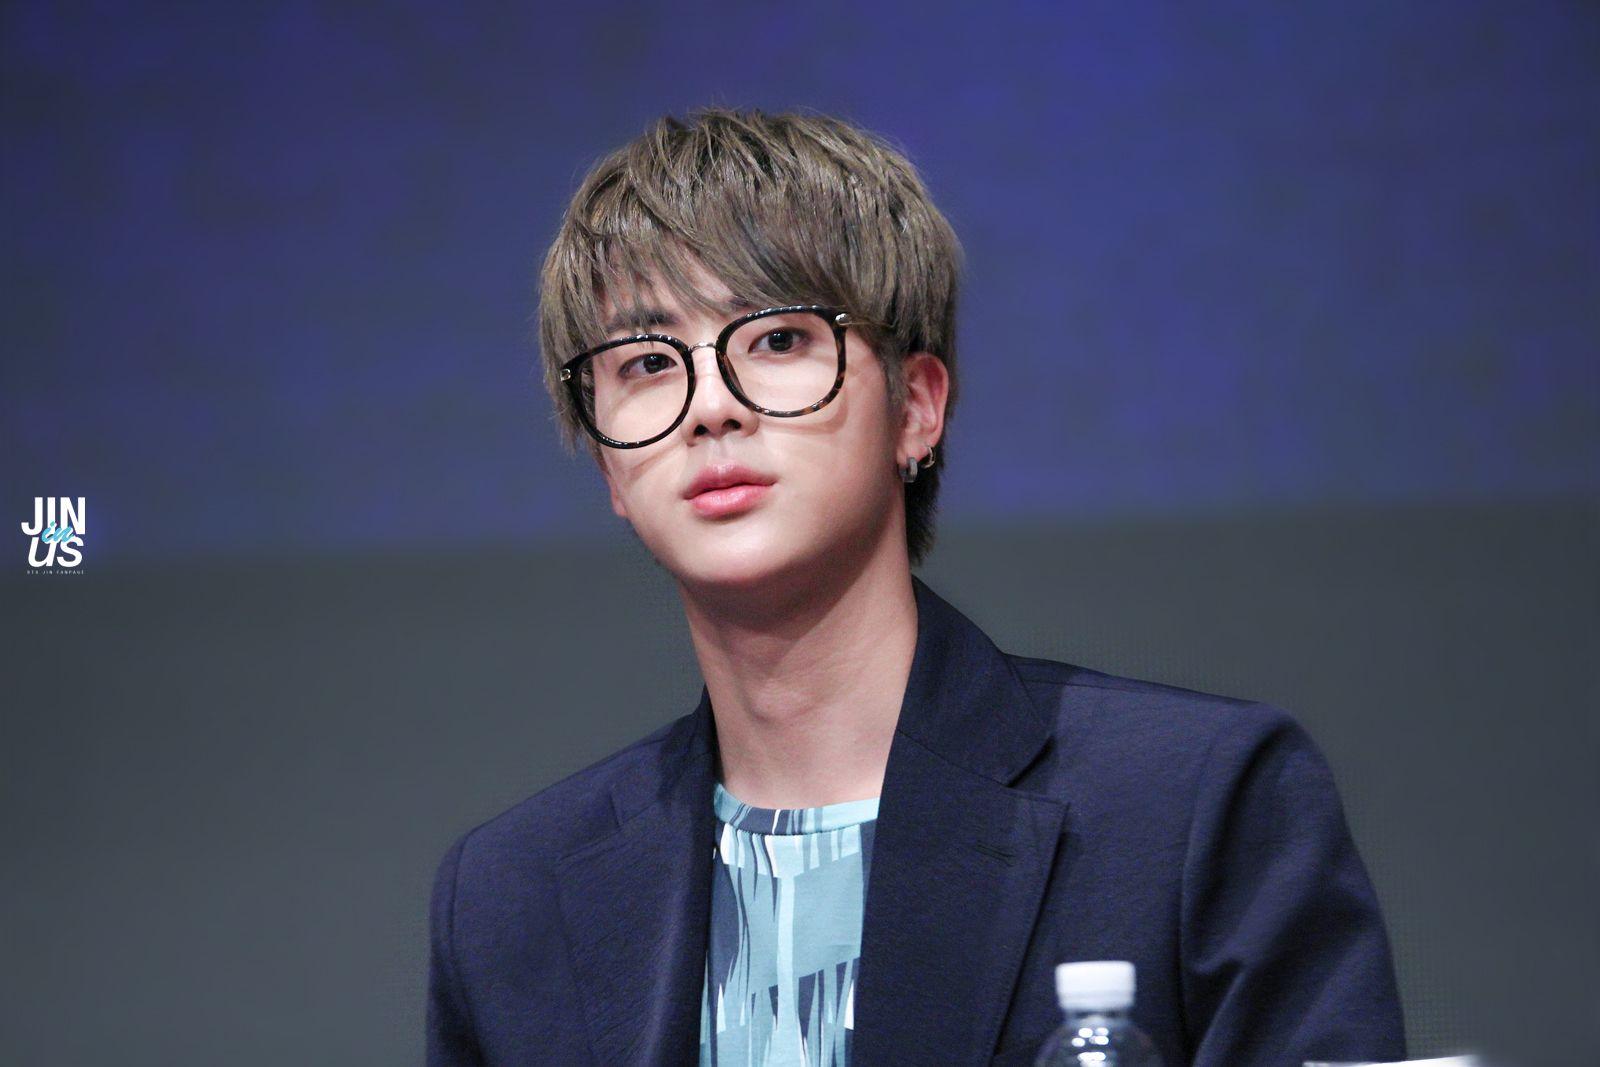 Korea blue glasses twink